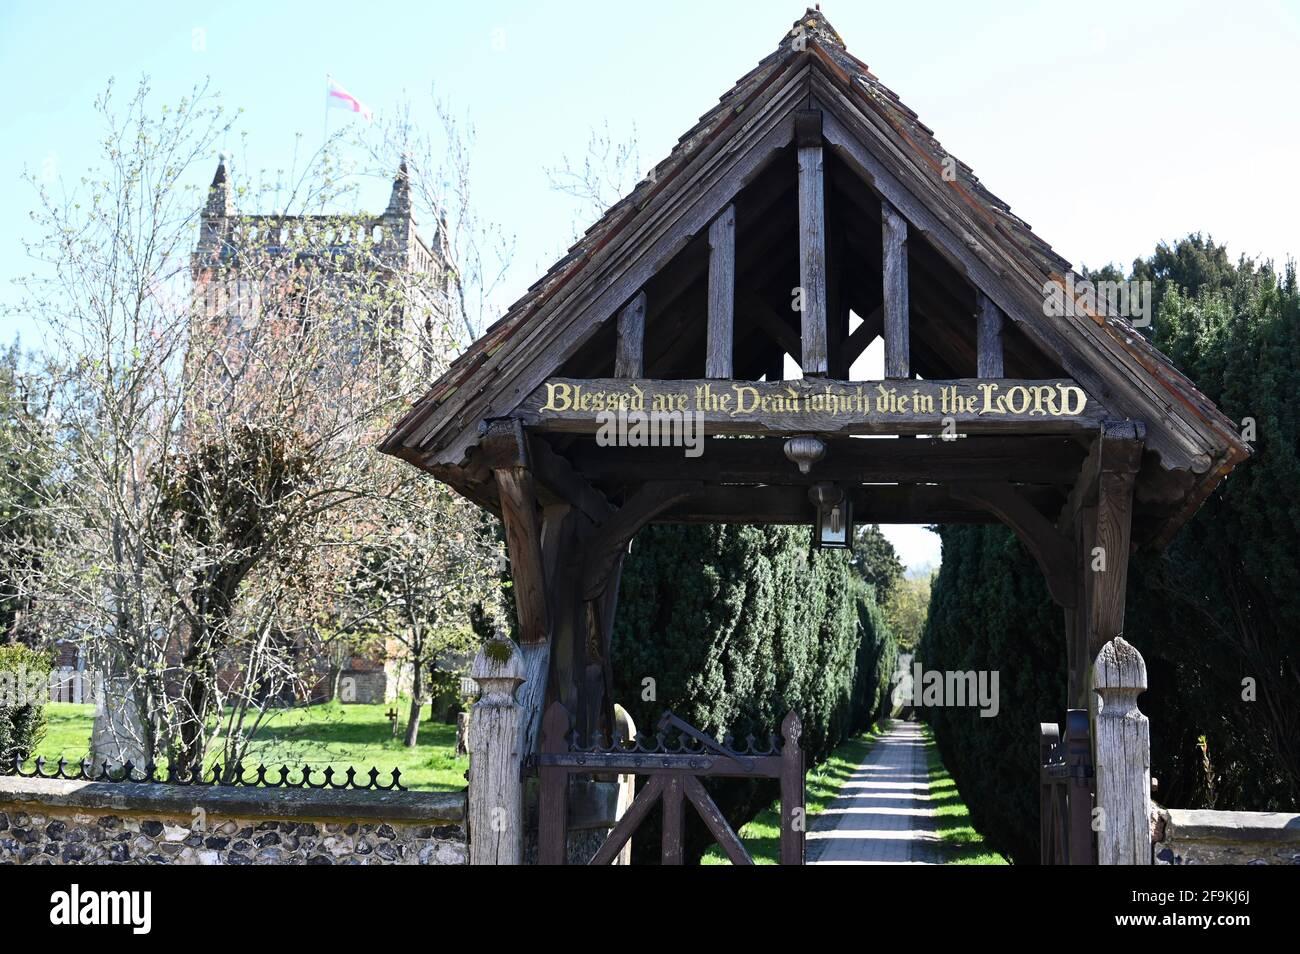 Lynchgate Church of St Peter & St Pauls, Shoreham, Sevenoaks, Kent. ROYAUME-UNI Banque D'Images